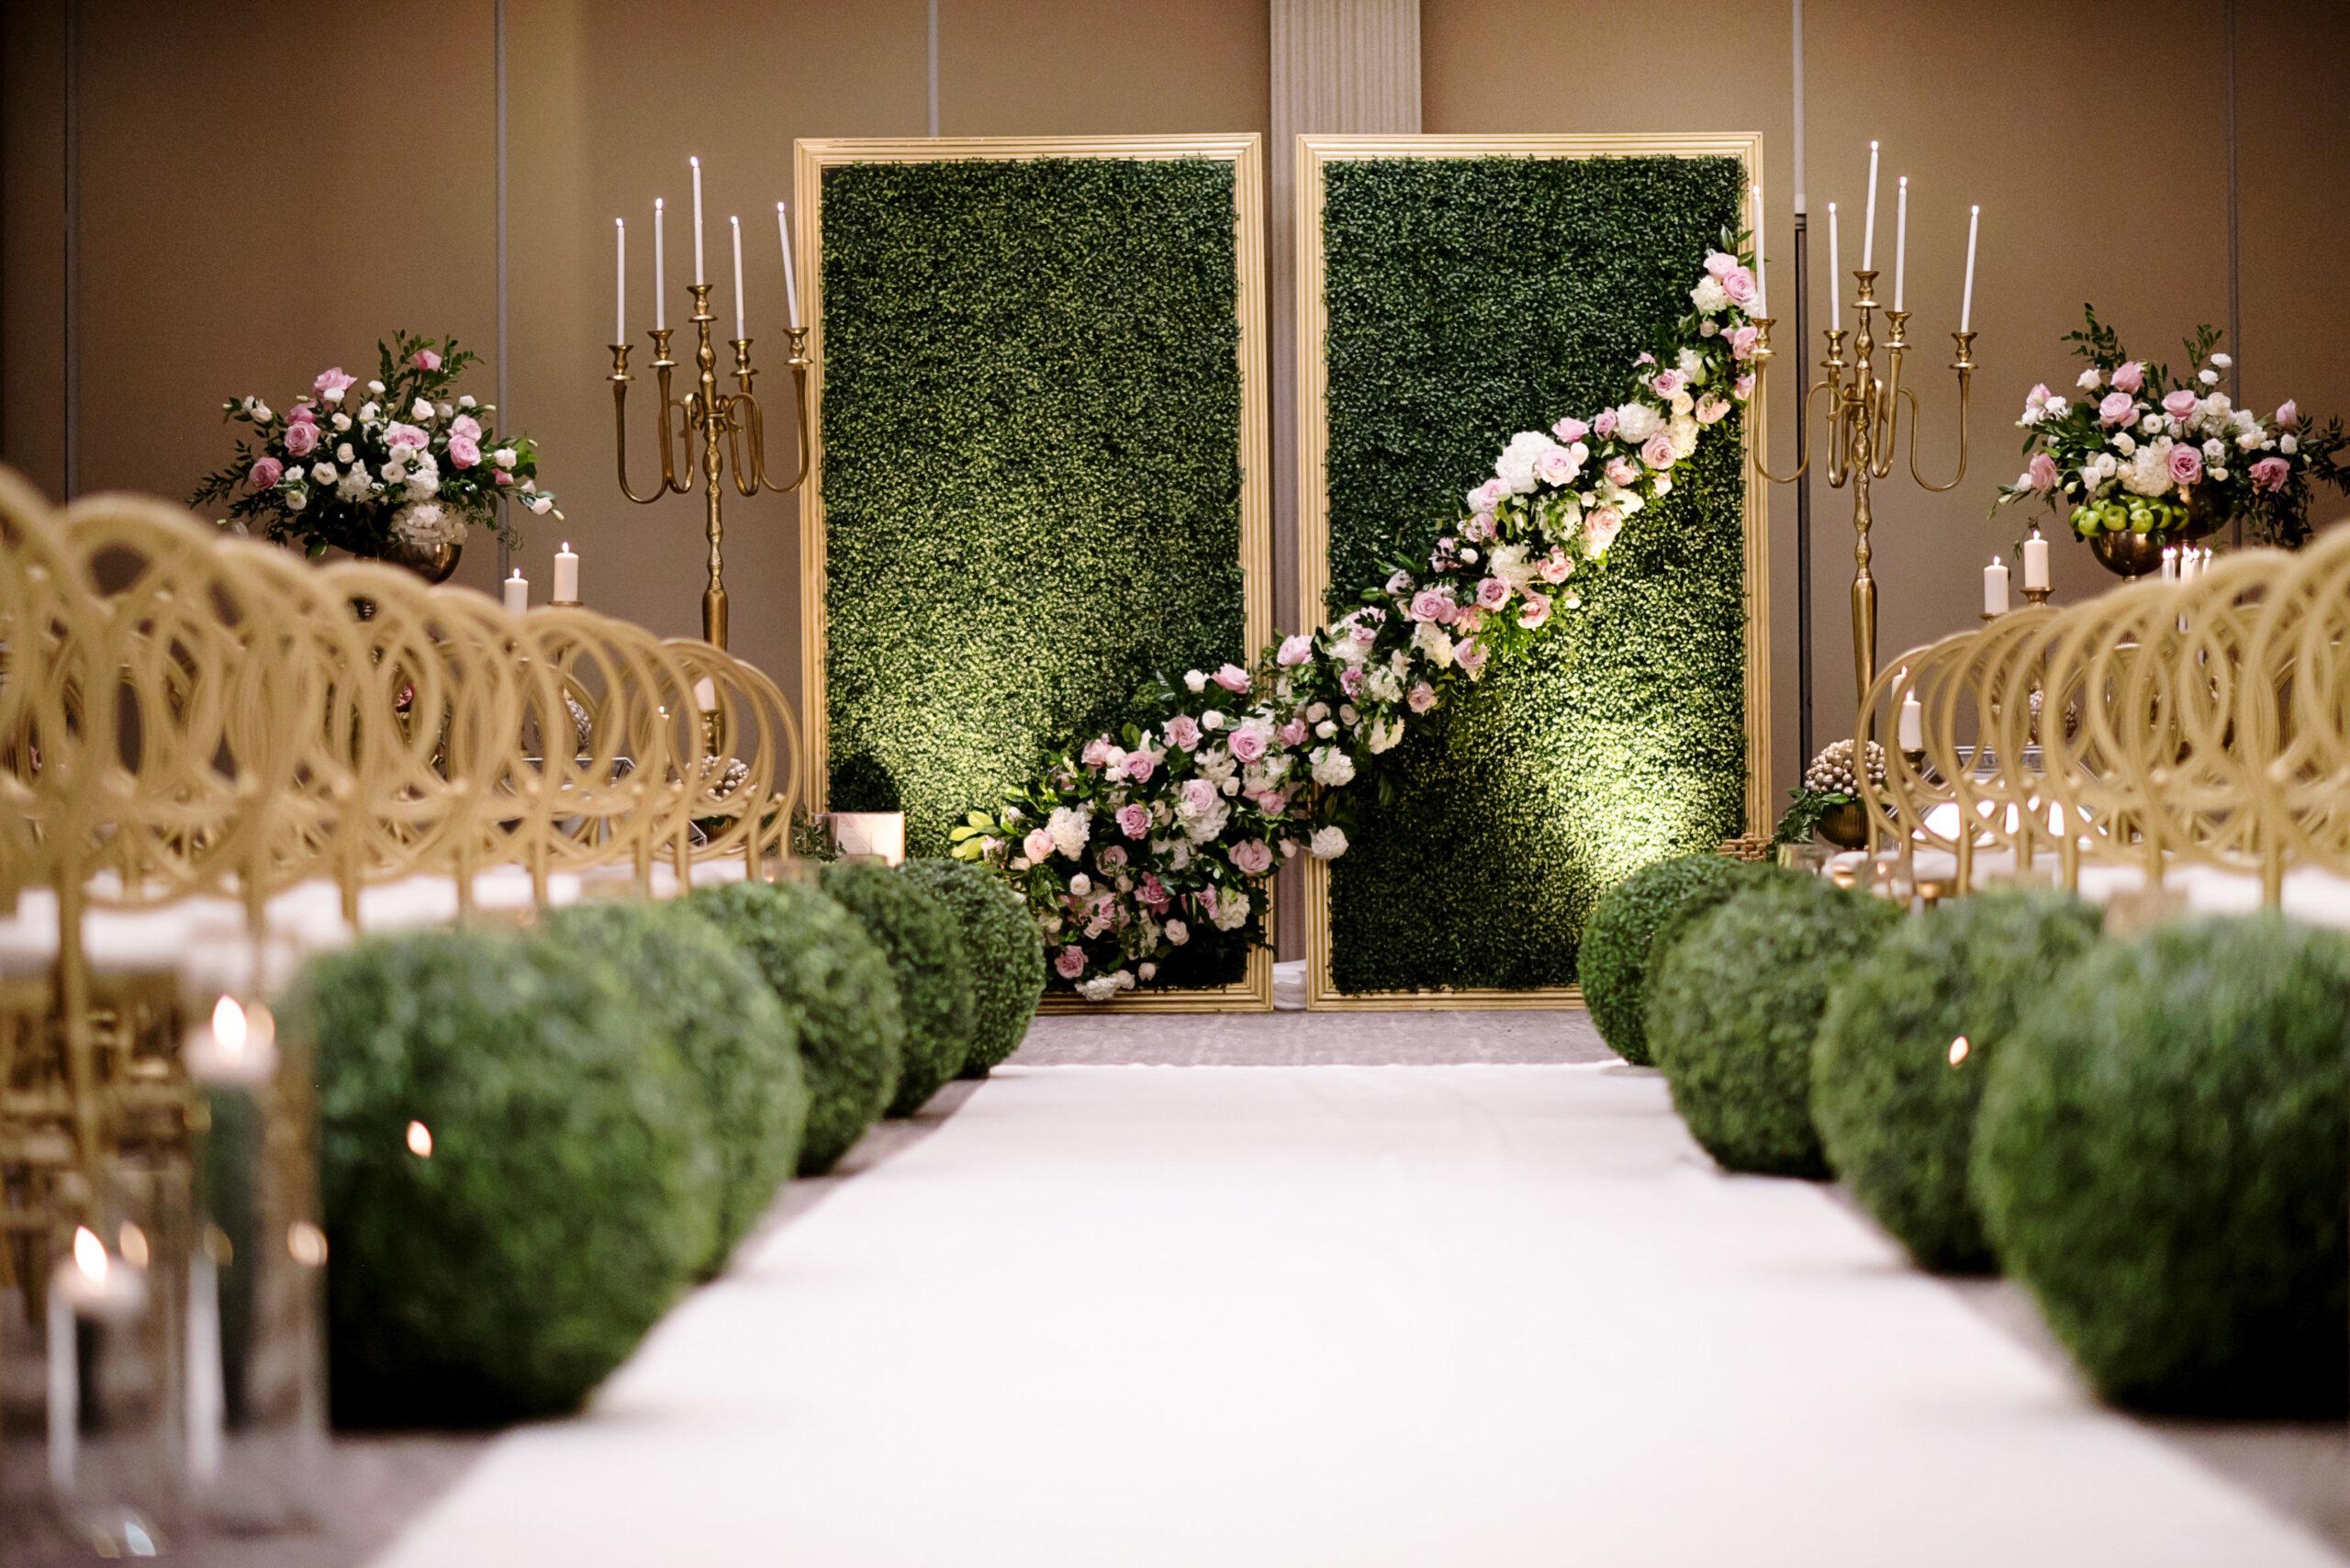 https://secureservercdn.net/45.40.145.151/kgq.ab5.myftpupload.com/wp-content/uploads/2020/04/Sanam-Soroush-s-Wedding-wedluxe-submission-0036-scaled.jpg?time=1600462602